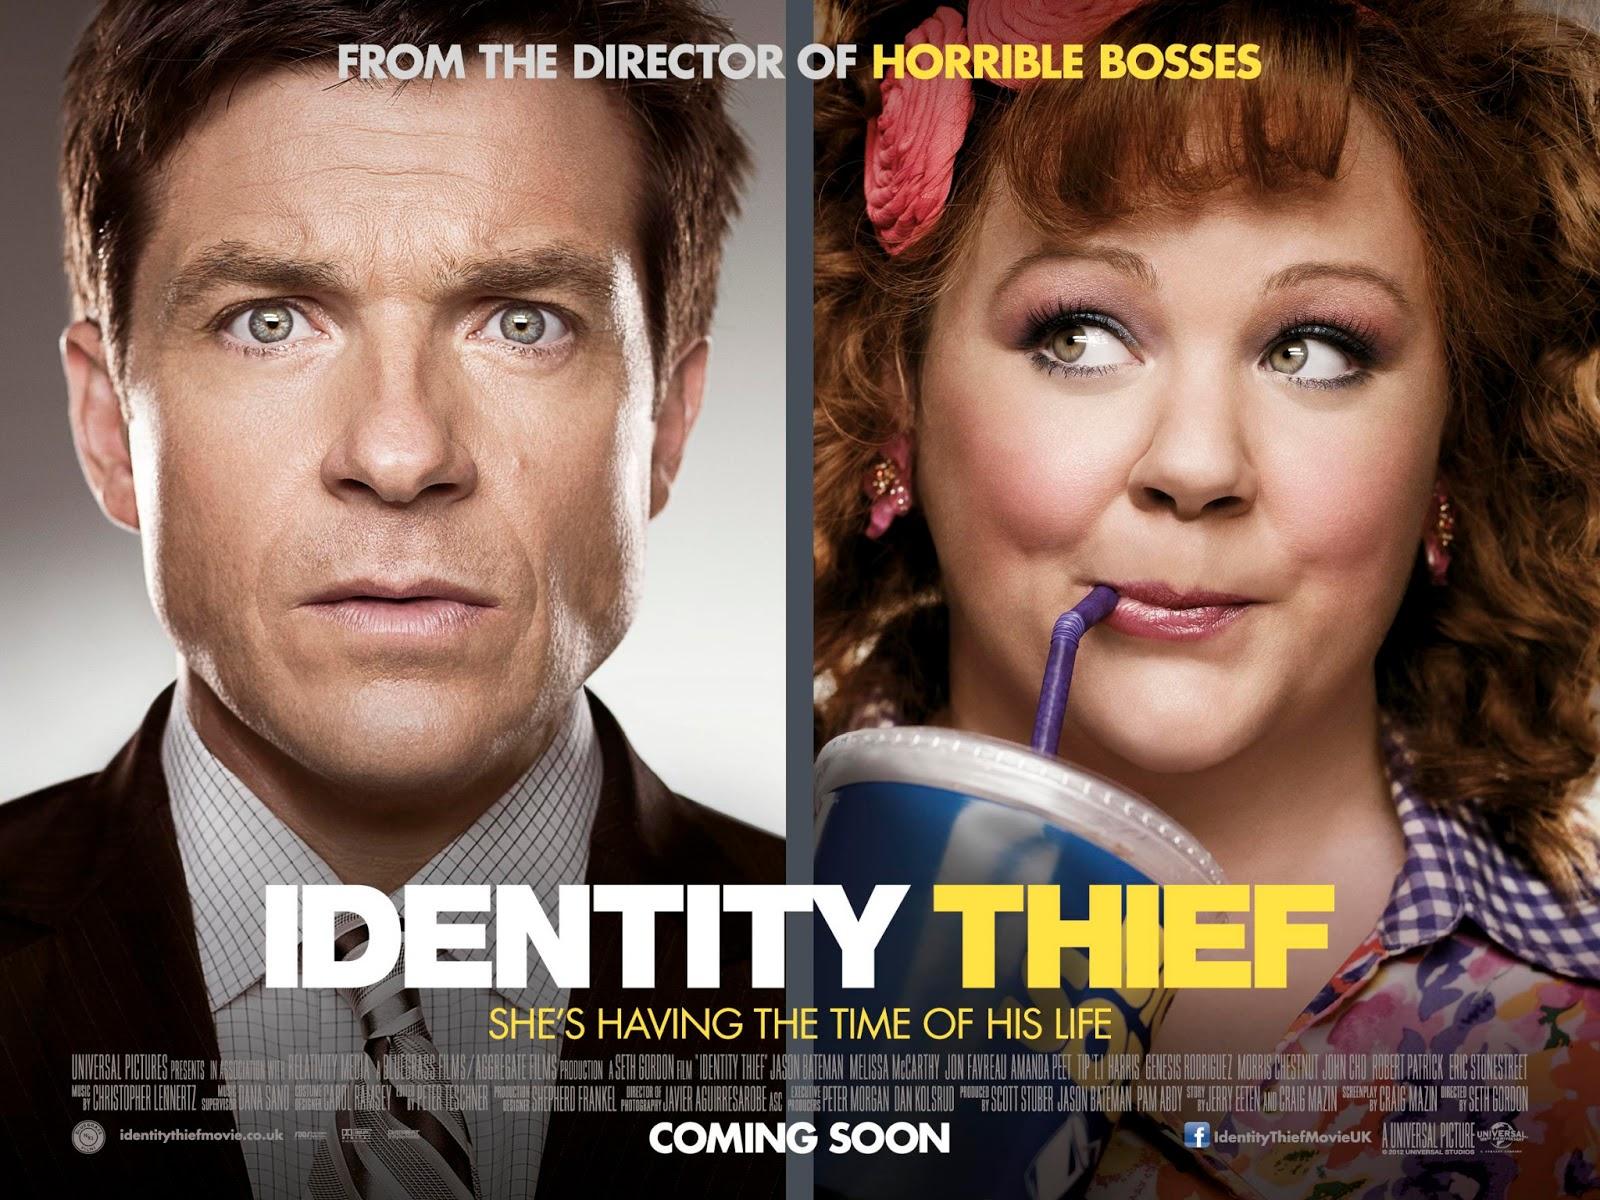 http://1.bp.blogspot.com/-DkIw-dKRLBk/USLquDzyrDI/AAAAAAAASpc/HHIy4eSWomU/s1600/identity-thief-uk-quad-poster.jpg